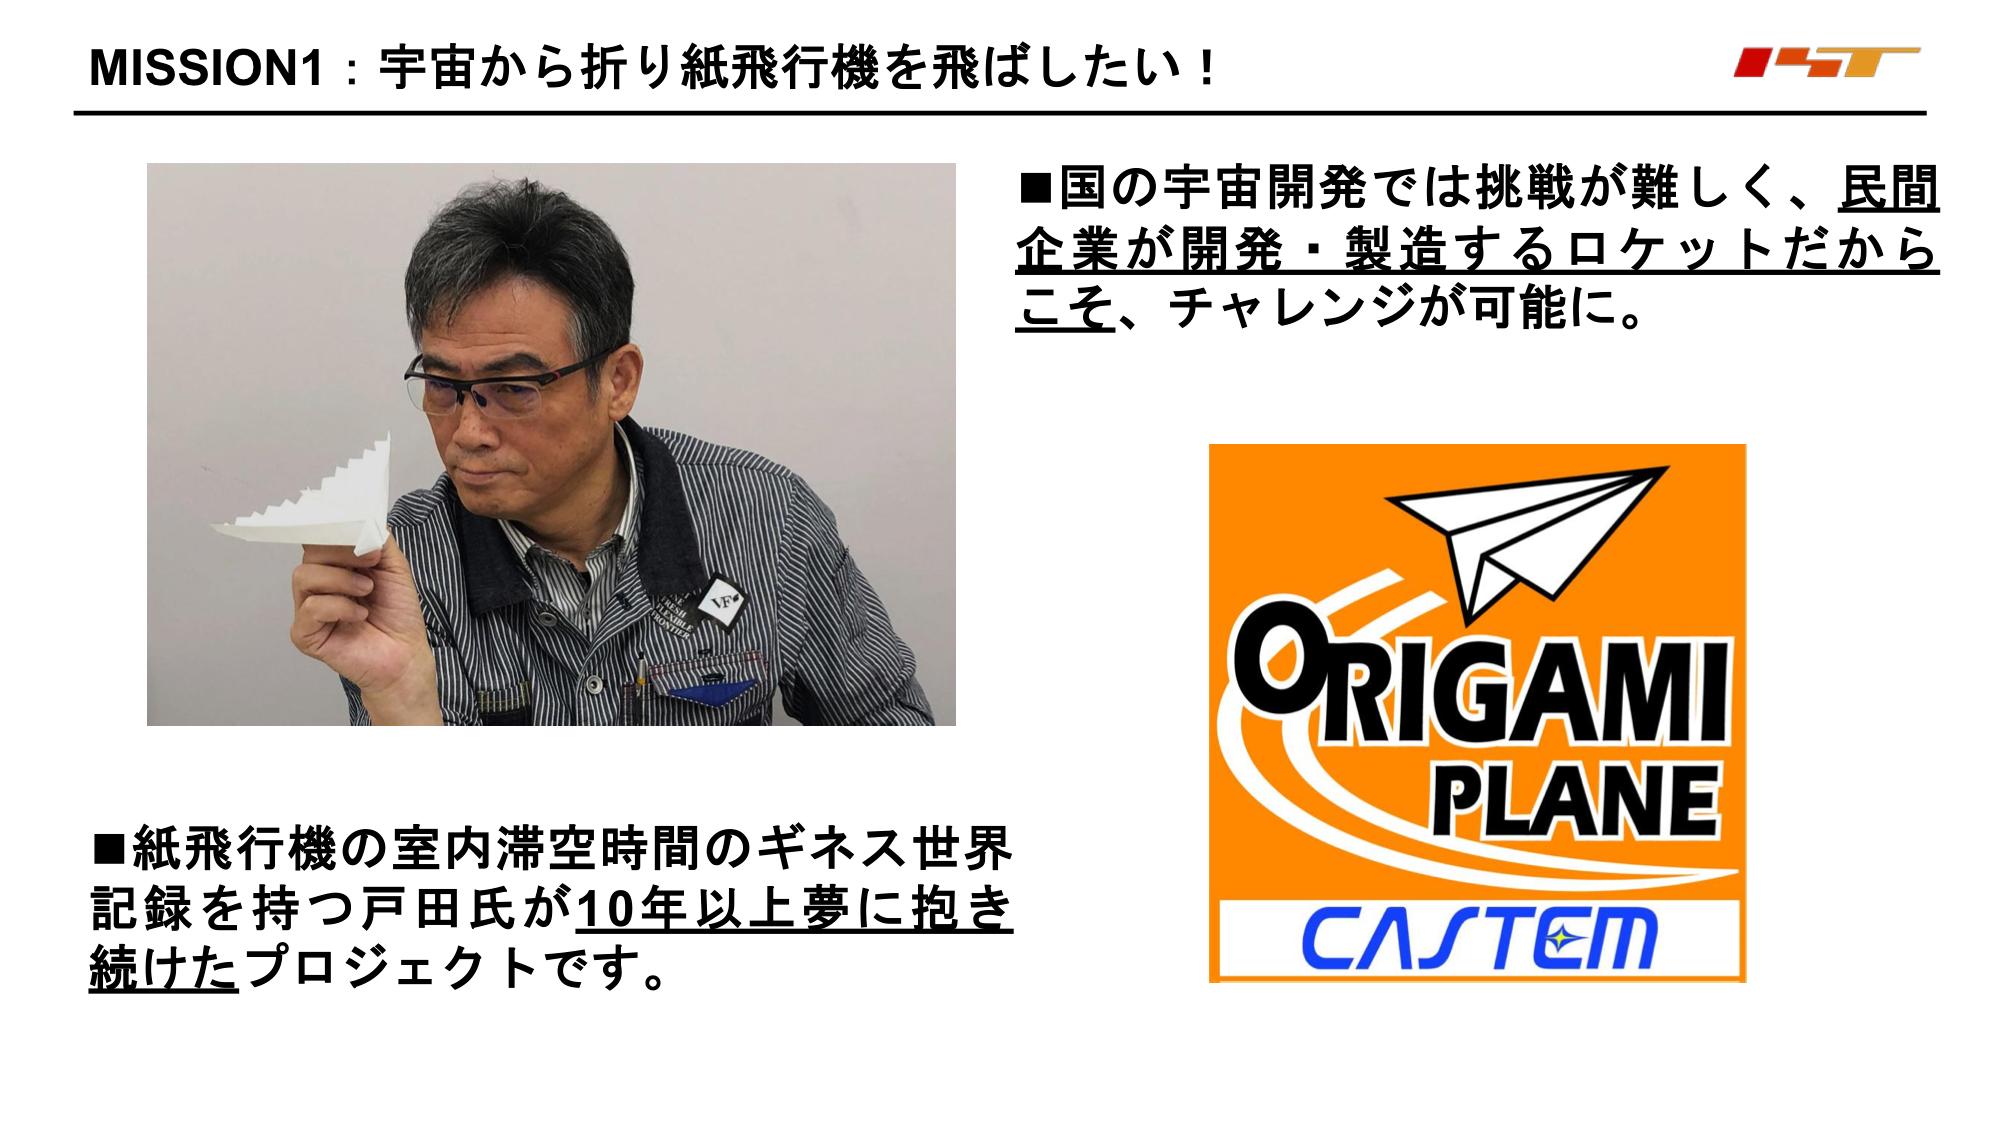 f:id:Imamura:20190628161201p:plain